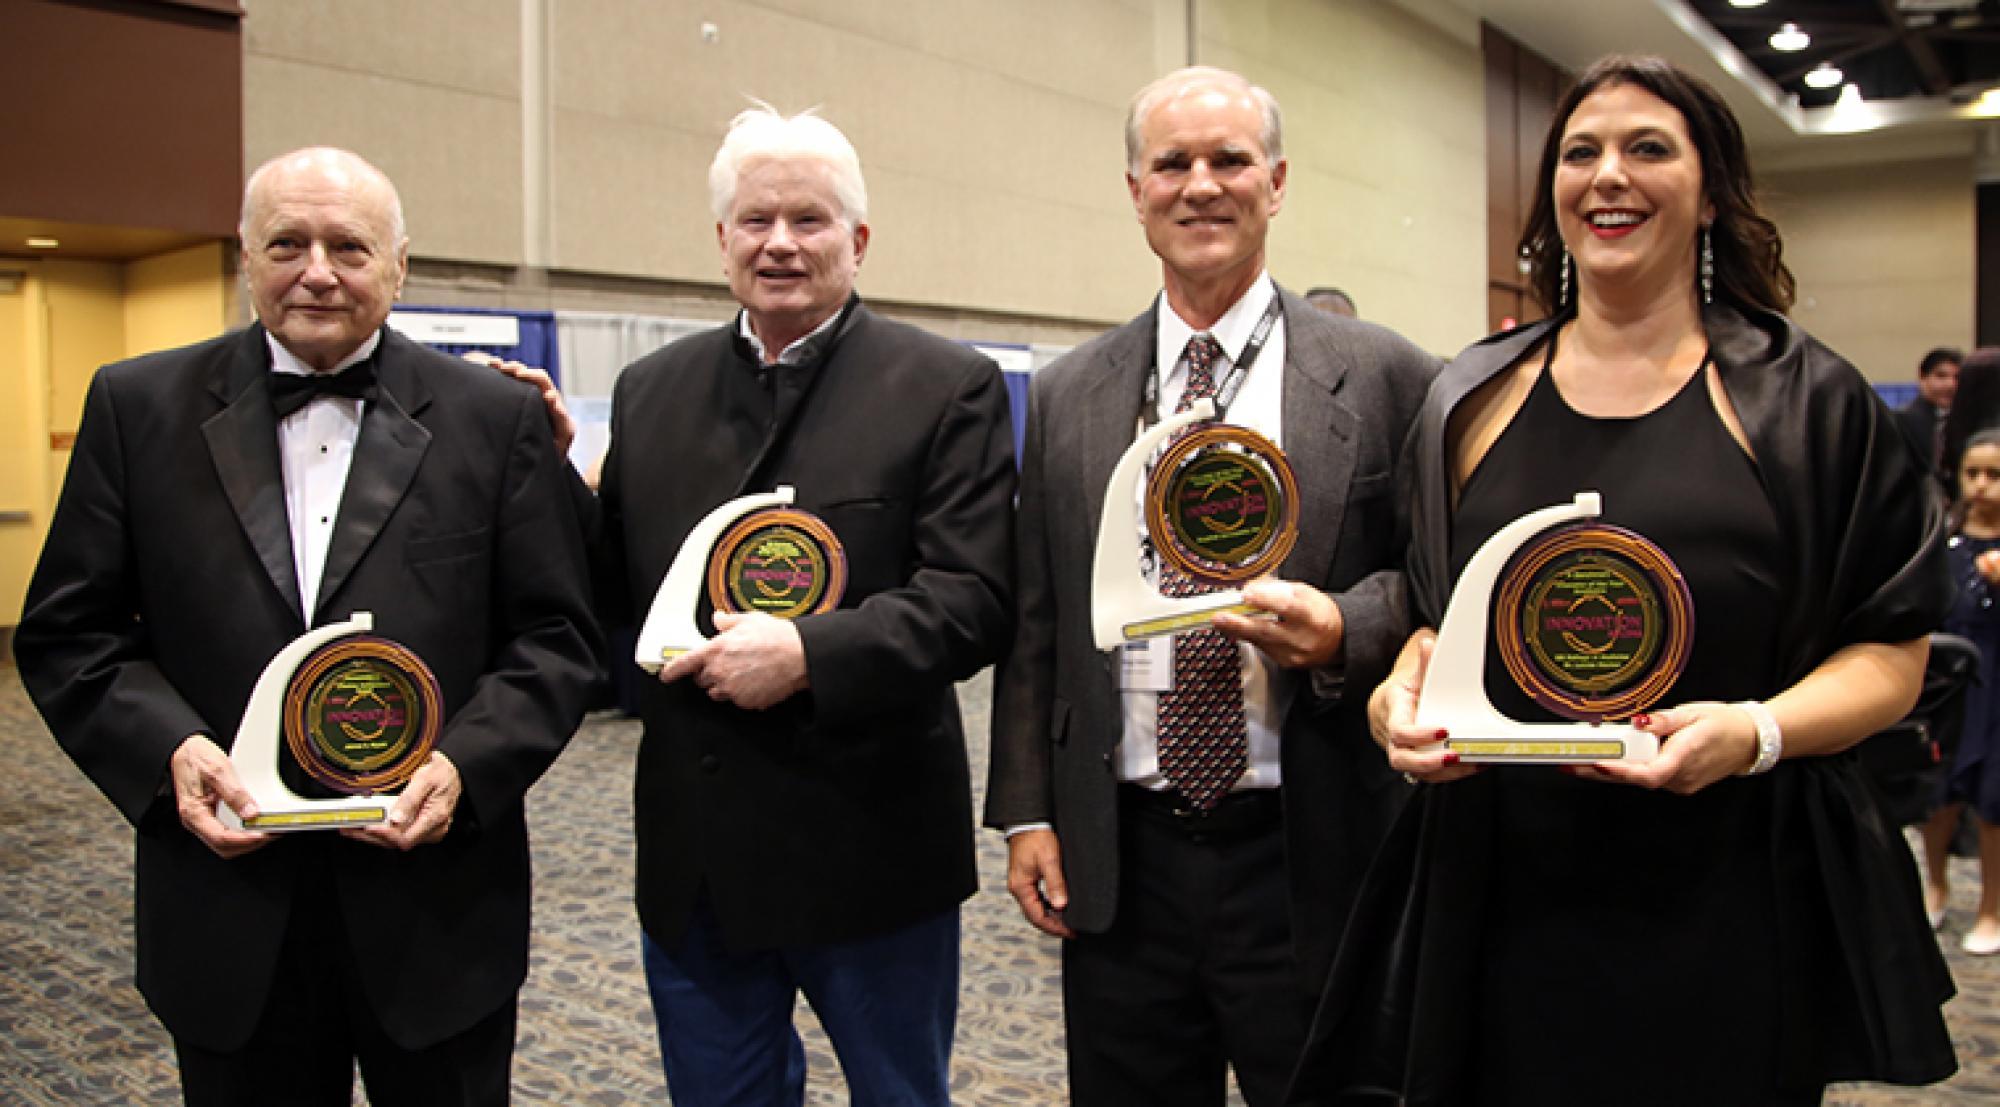 James C. Wyant, Fletcher McCusker, Doug Stetson and Louise Hecker